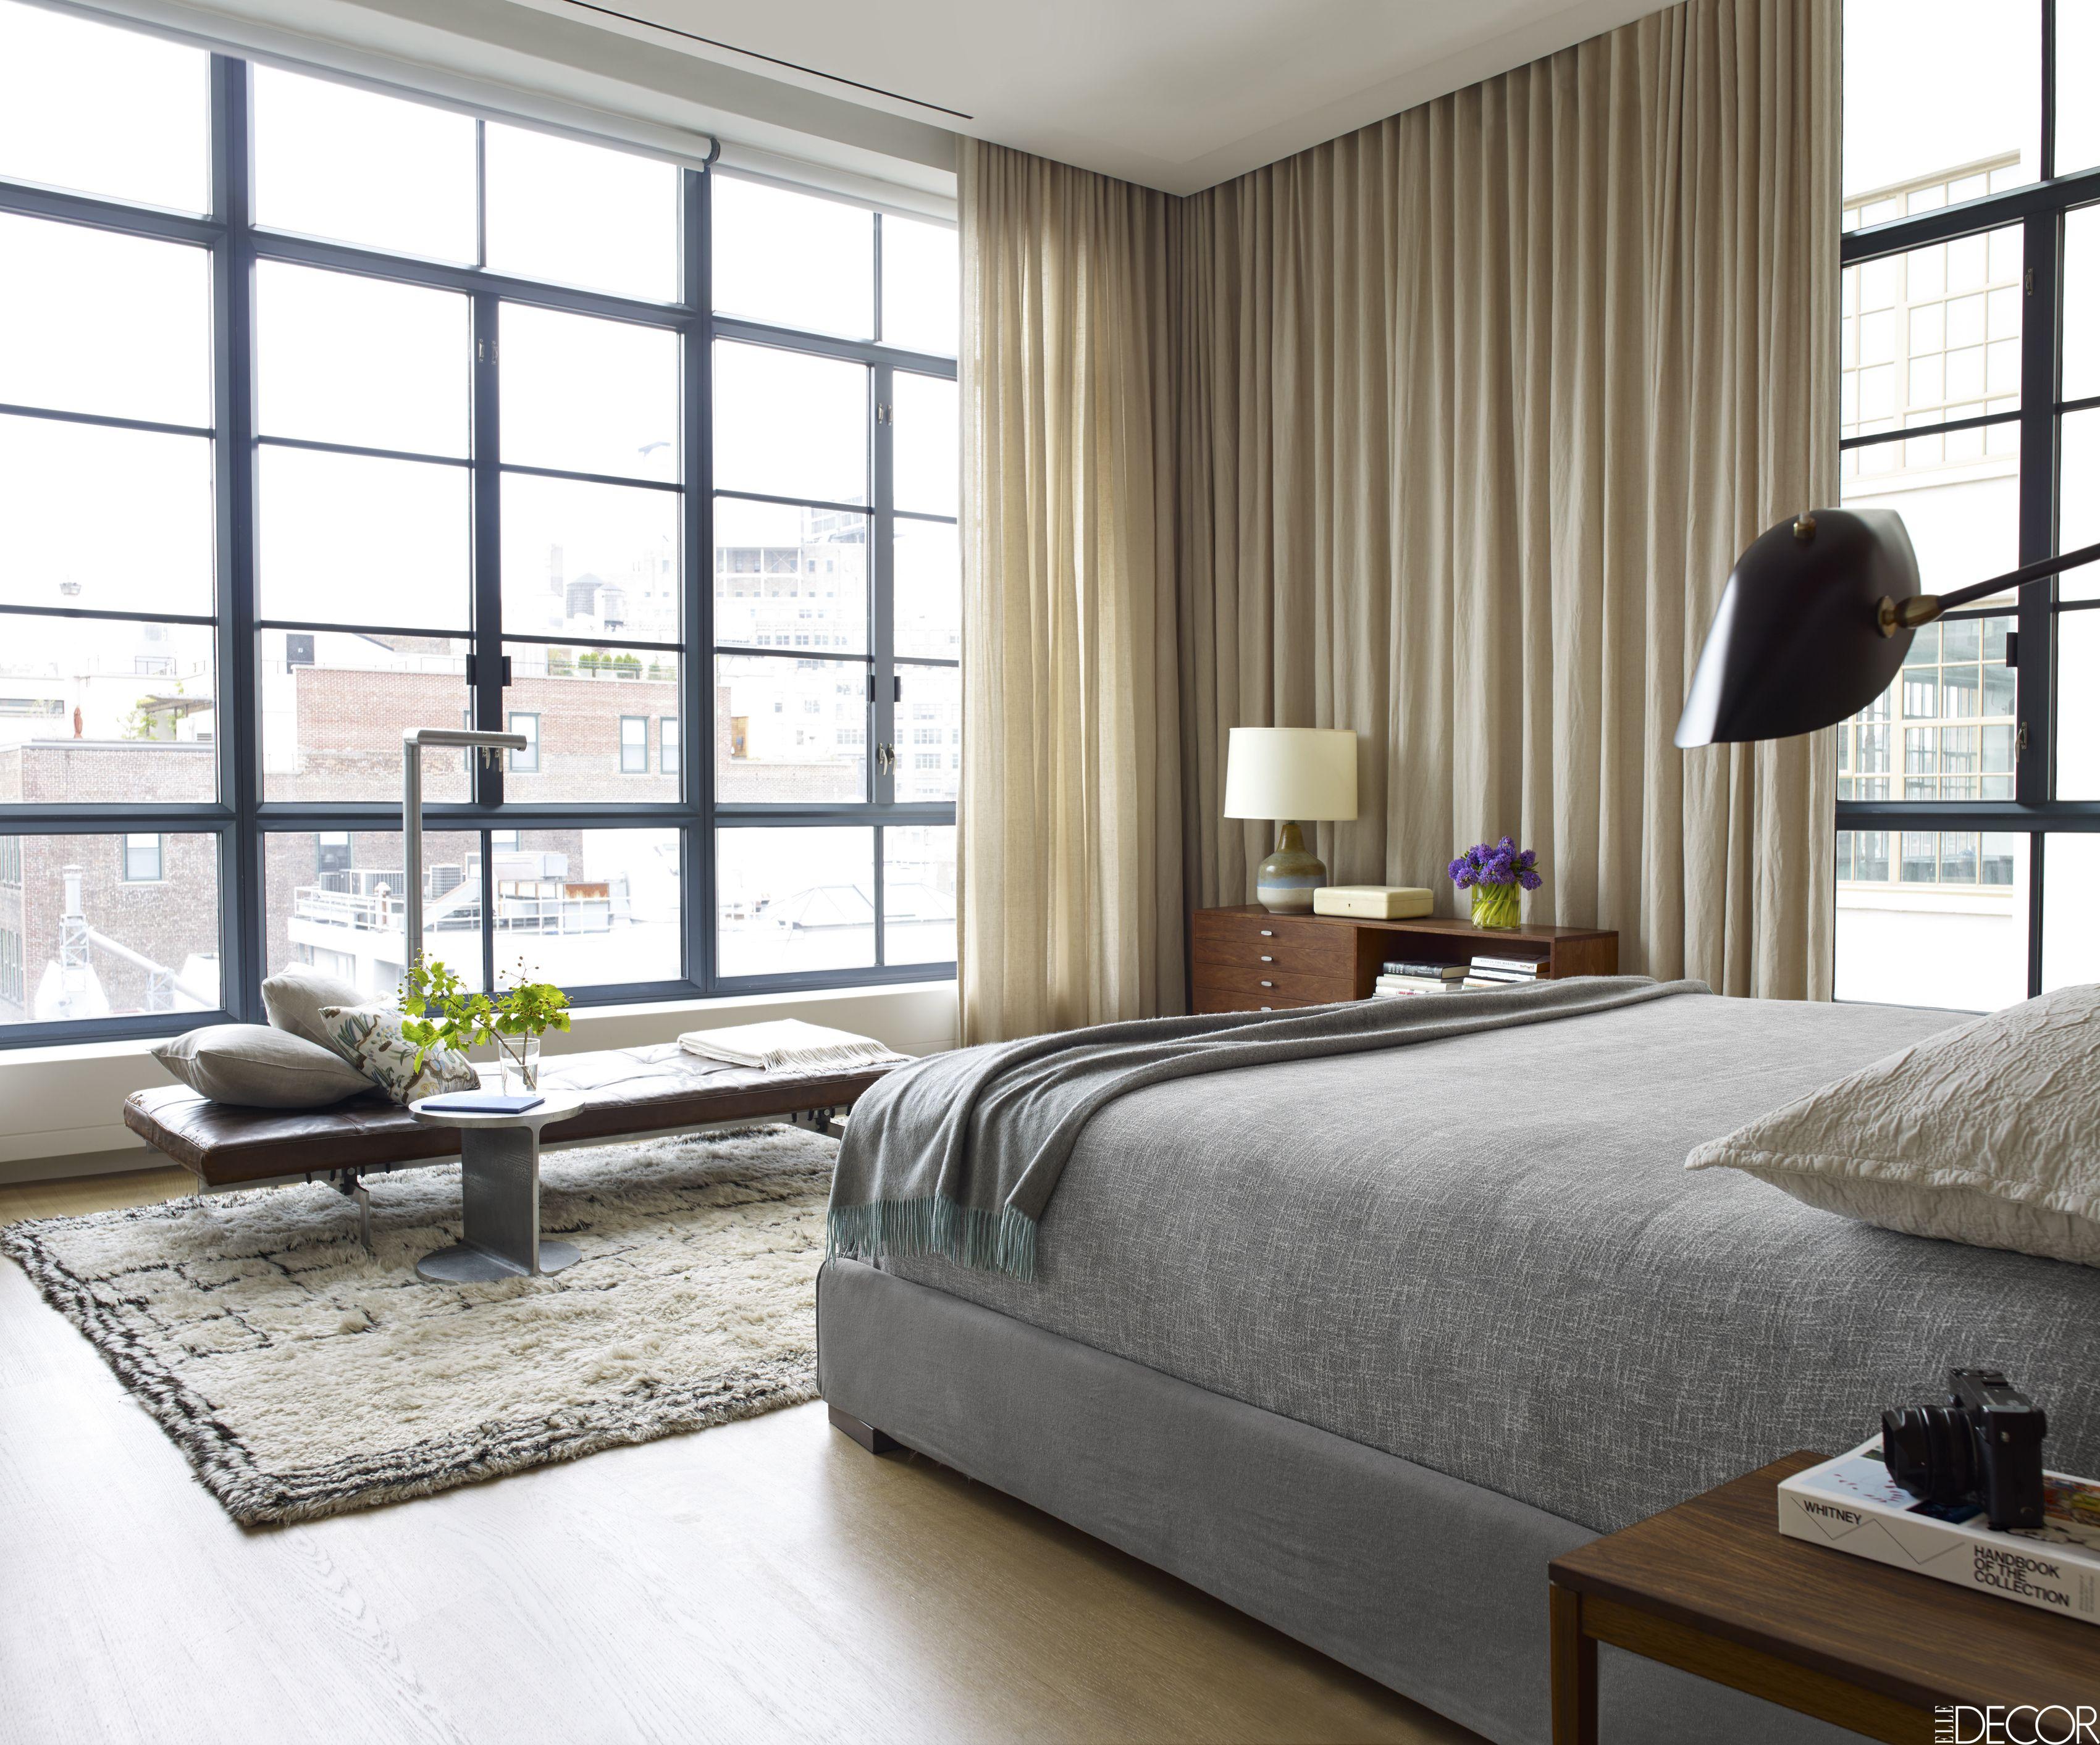 cdca23fb7224c 27 Mid-Century Modern Design Rooms - Mid-Century Style Ideas